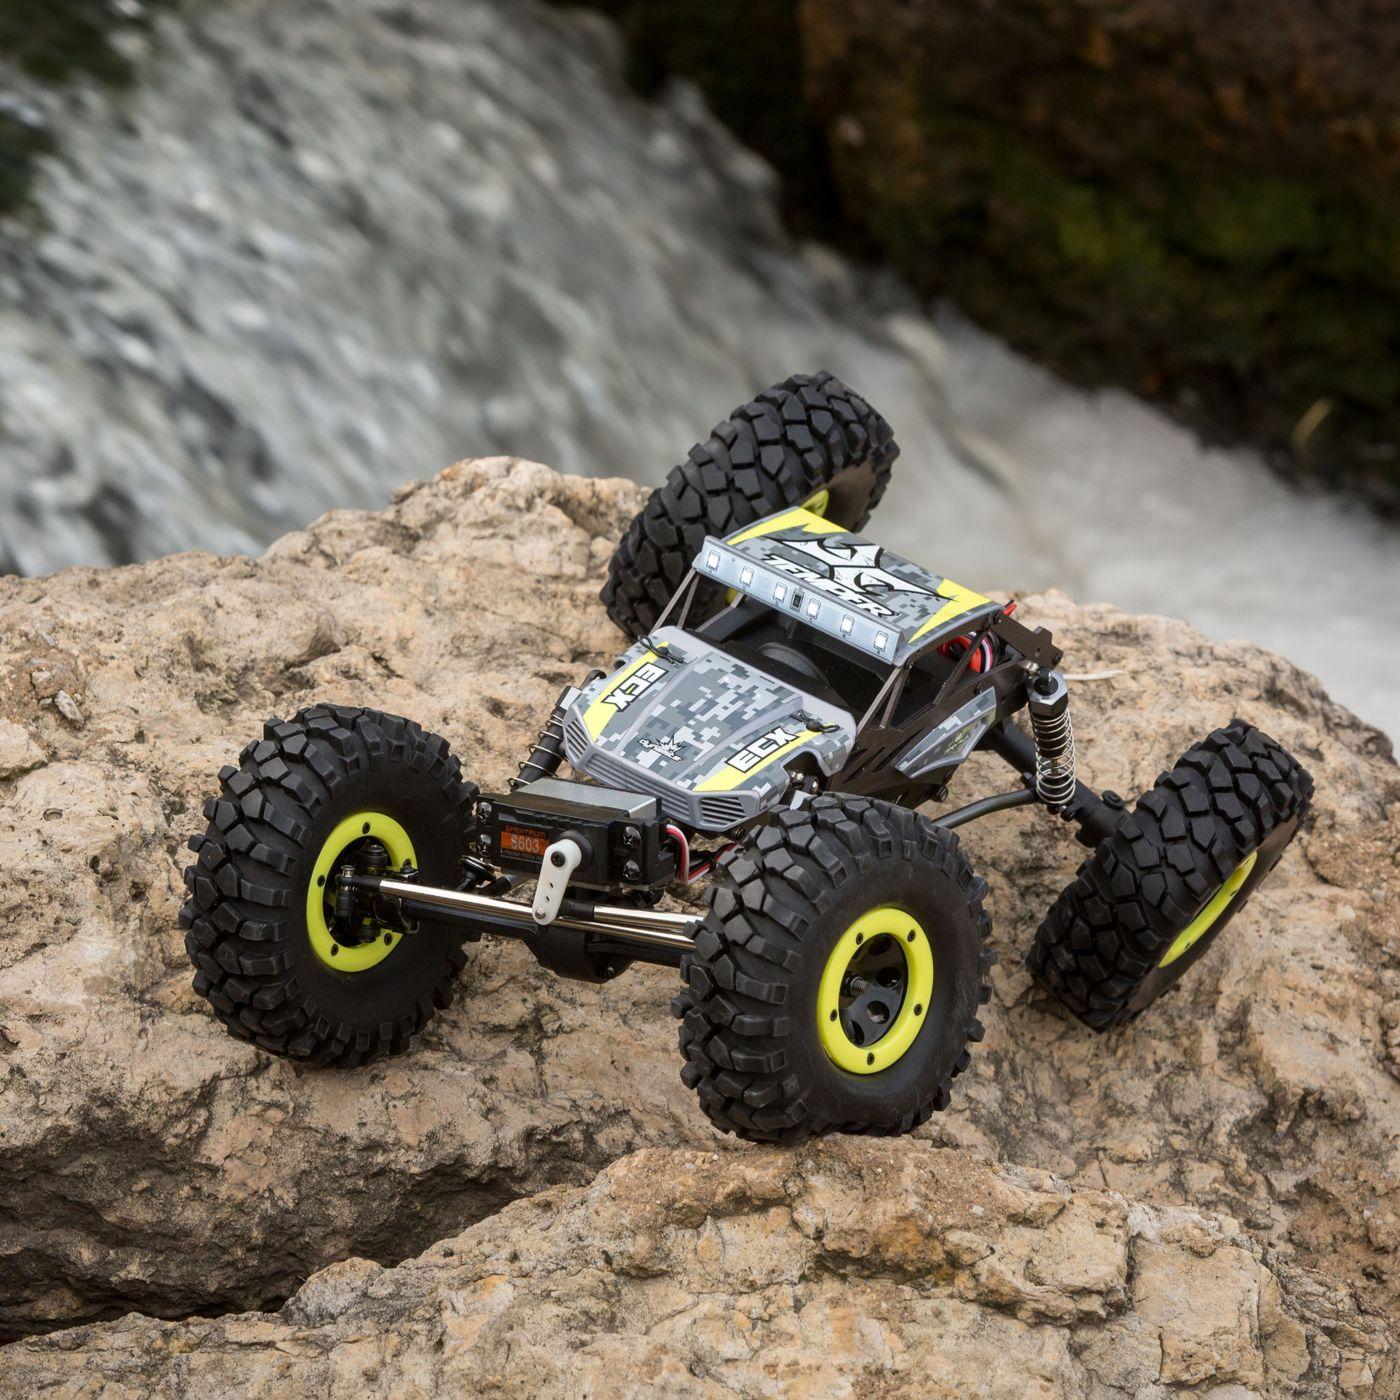 ECX Temper 1-18 GEN2 RC Crawler - On The Rocks